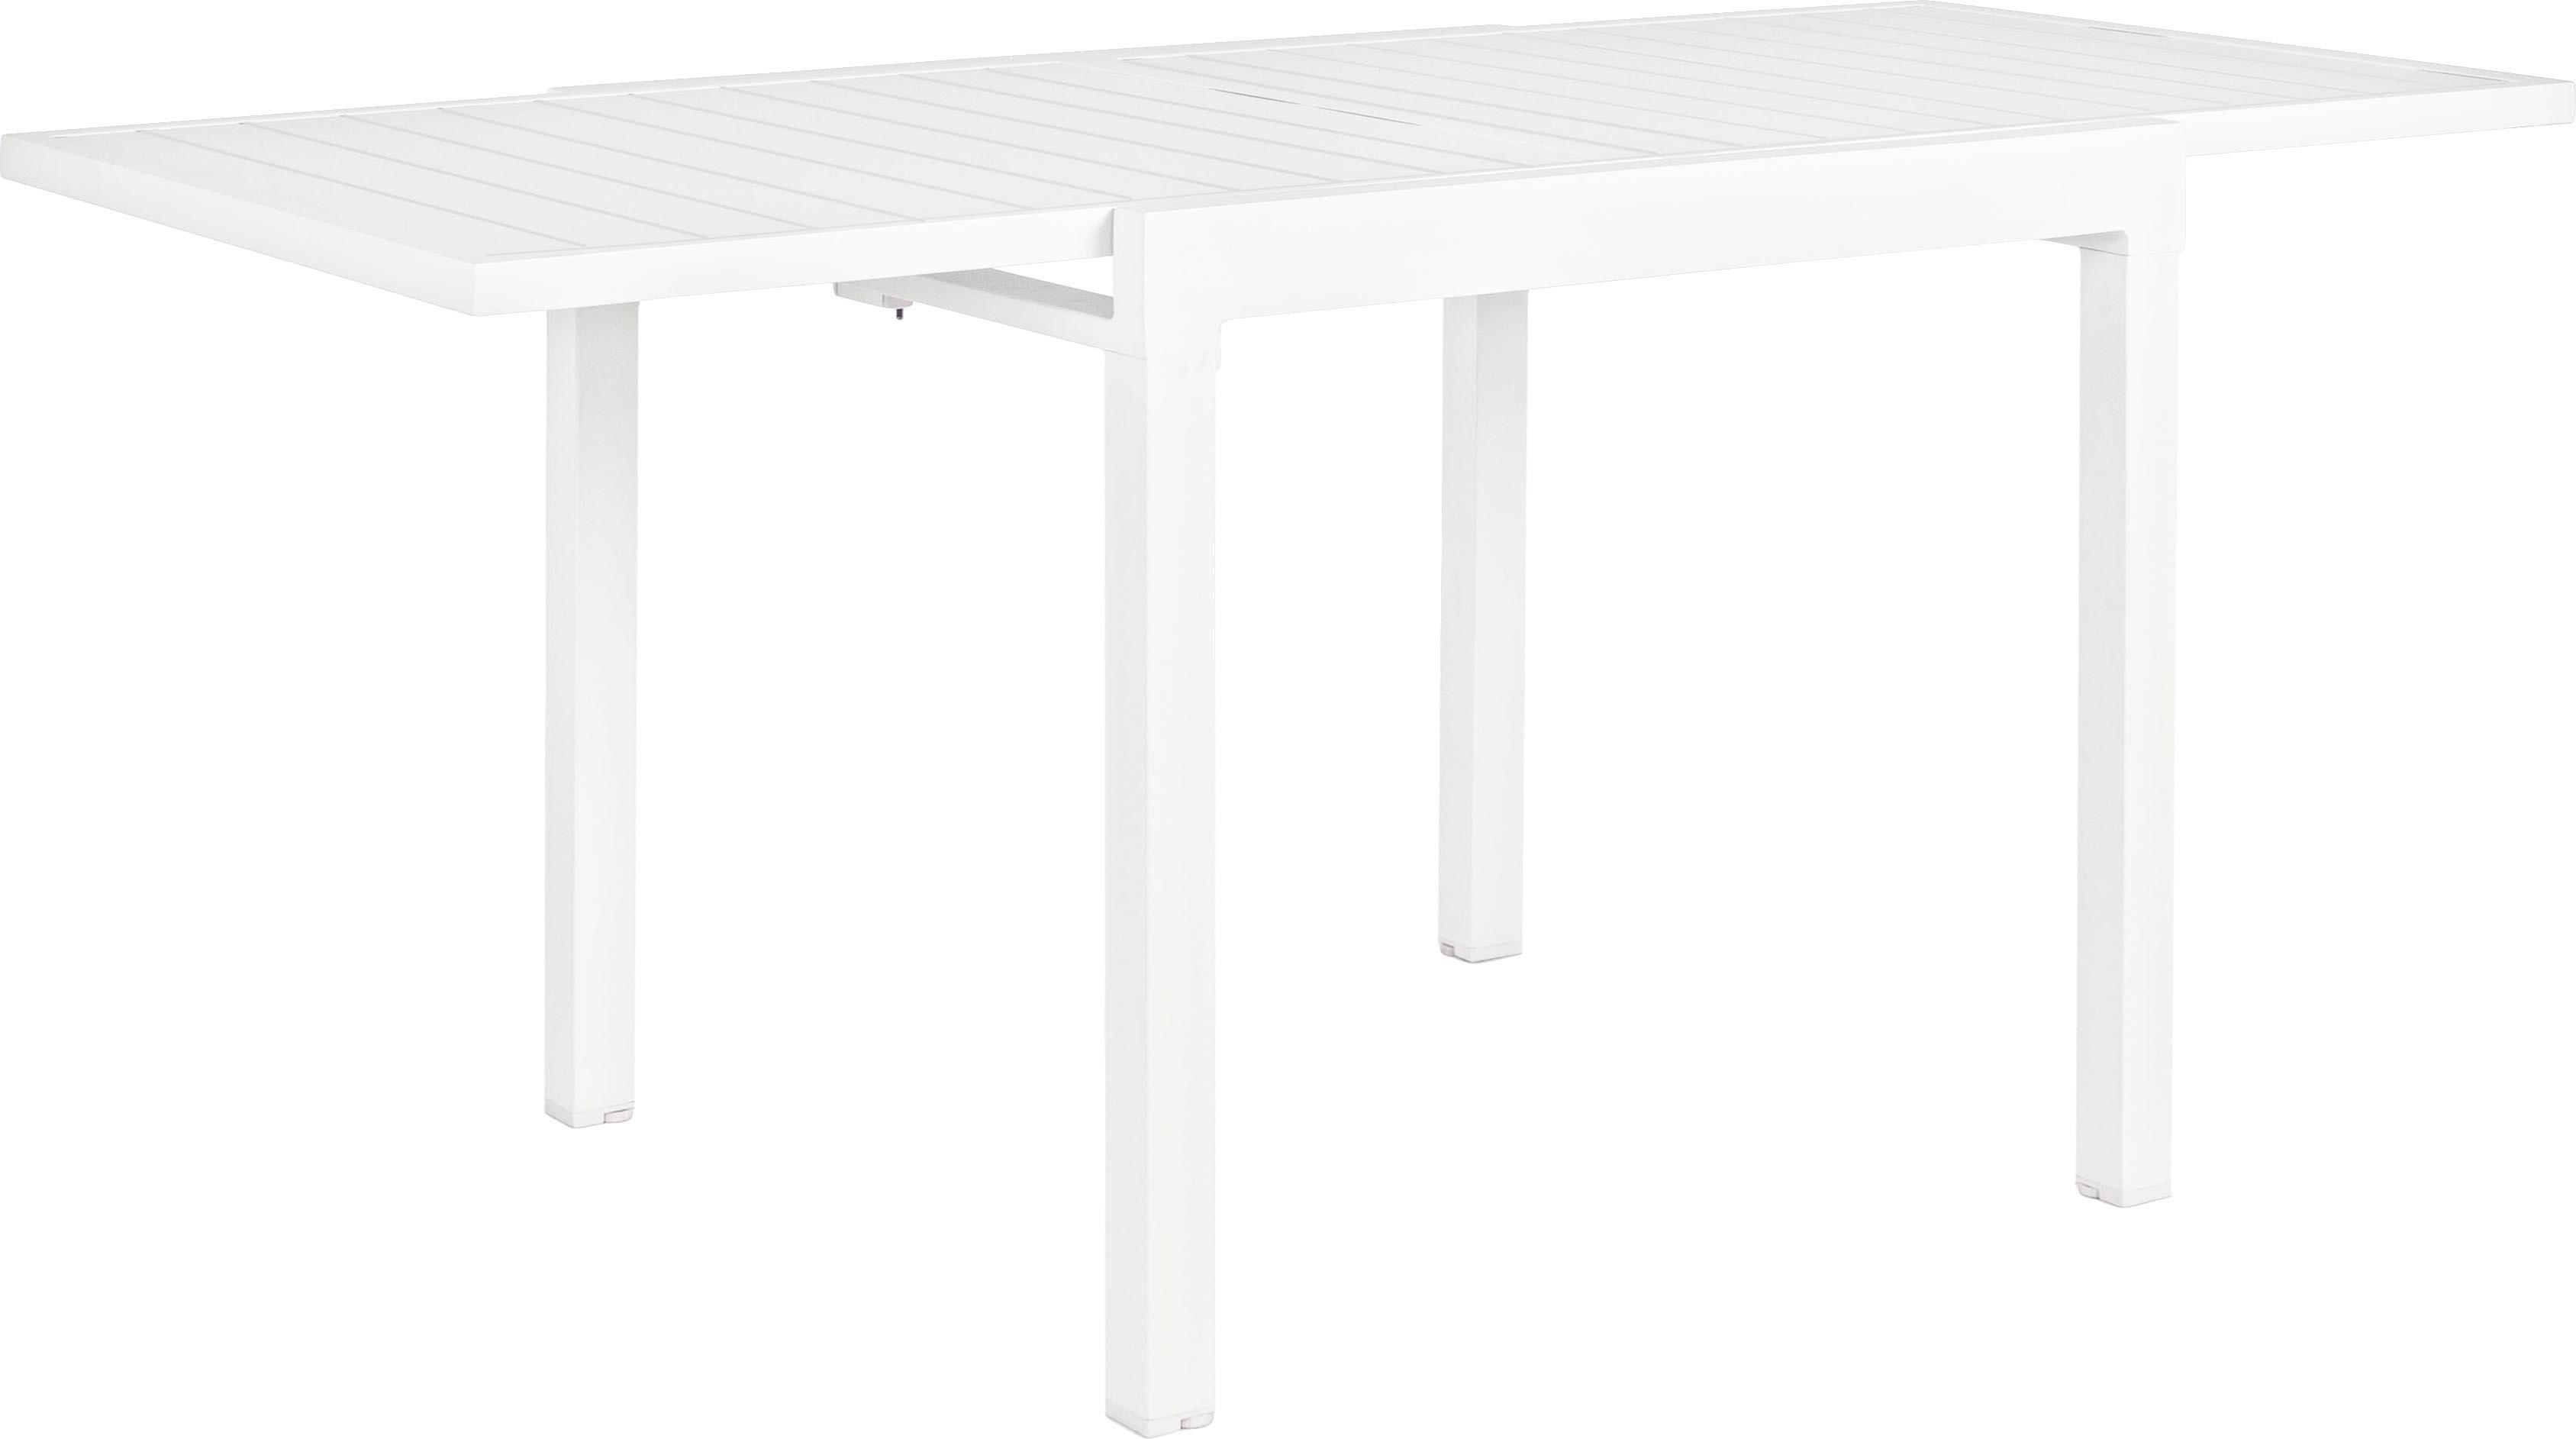 Gartentisch Pelagius, ausziehbar, Aluminium, pulverbeschichtet, Weiss, B 83 bis 166 x T 80 cm